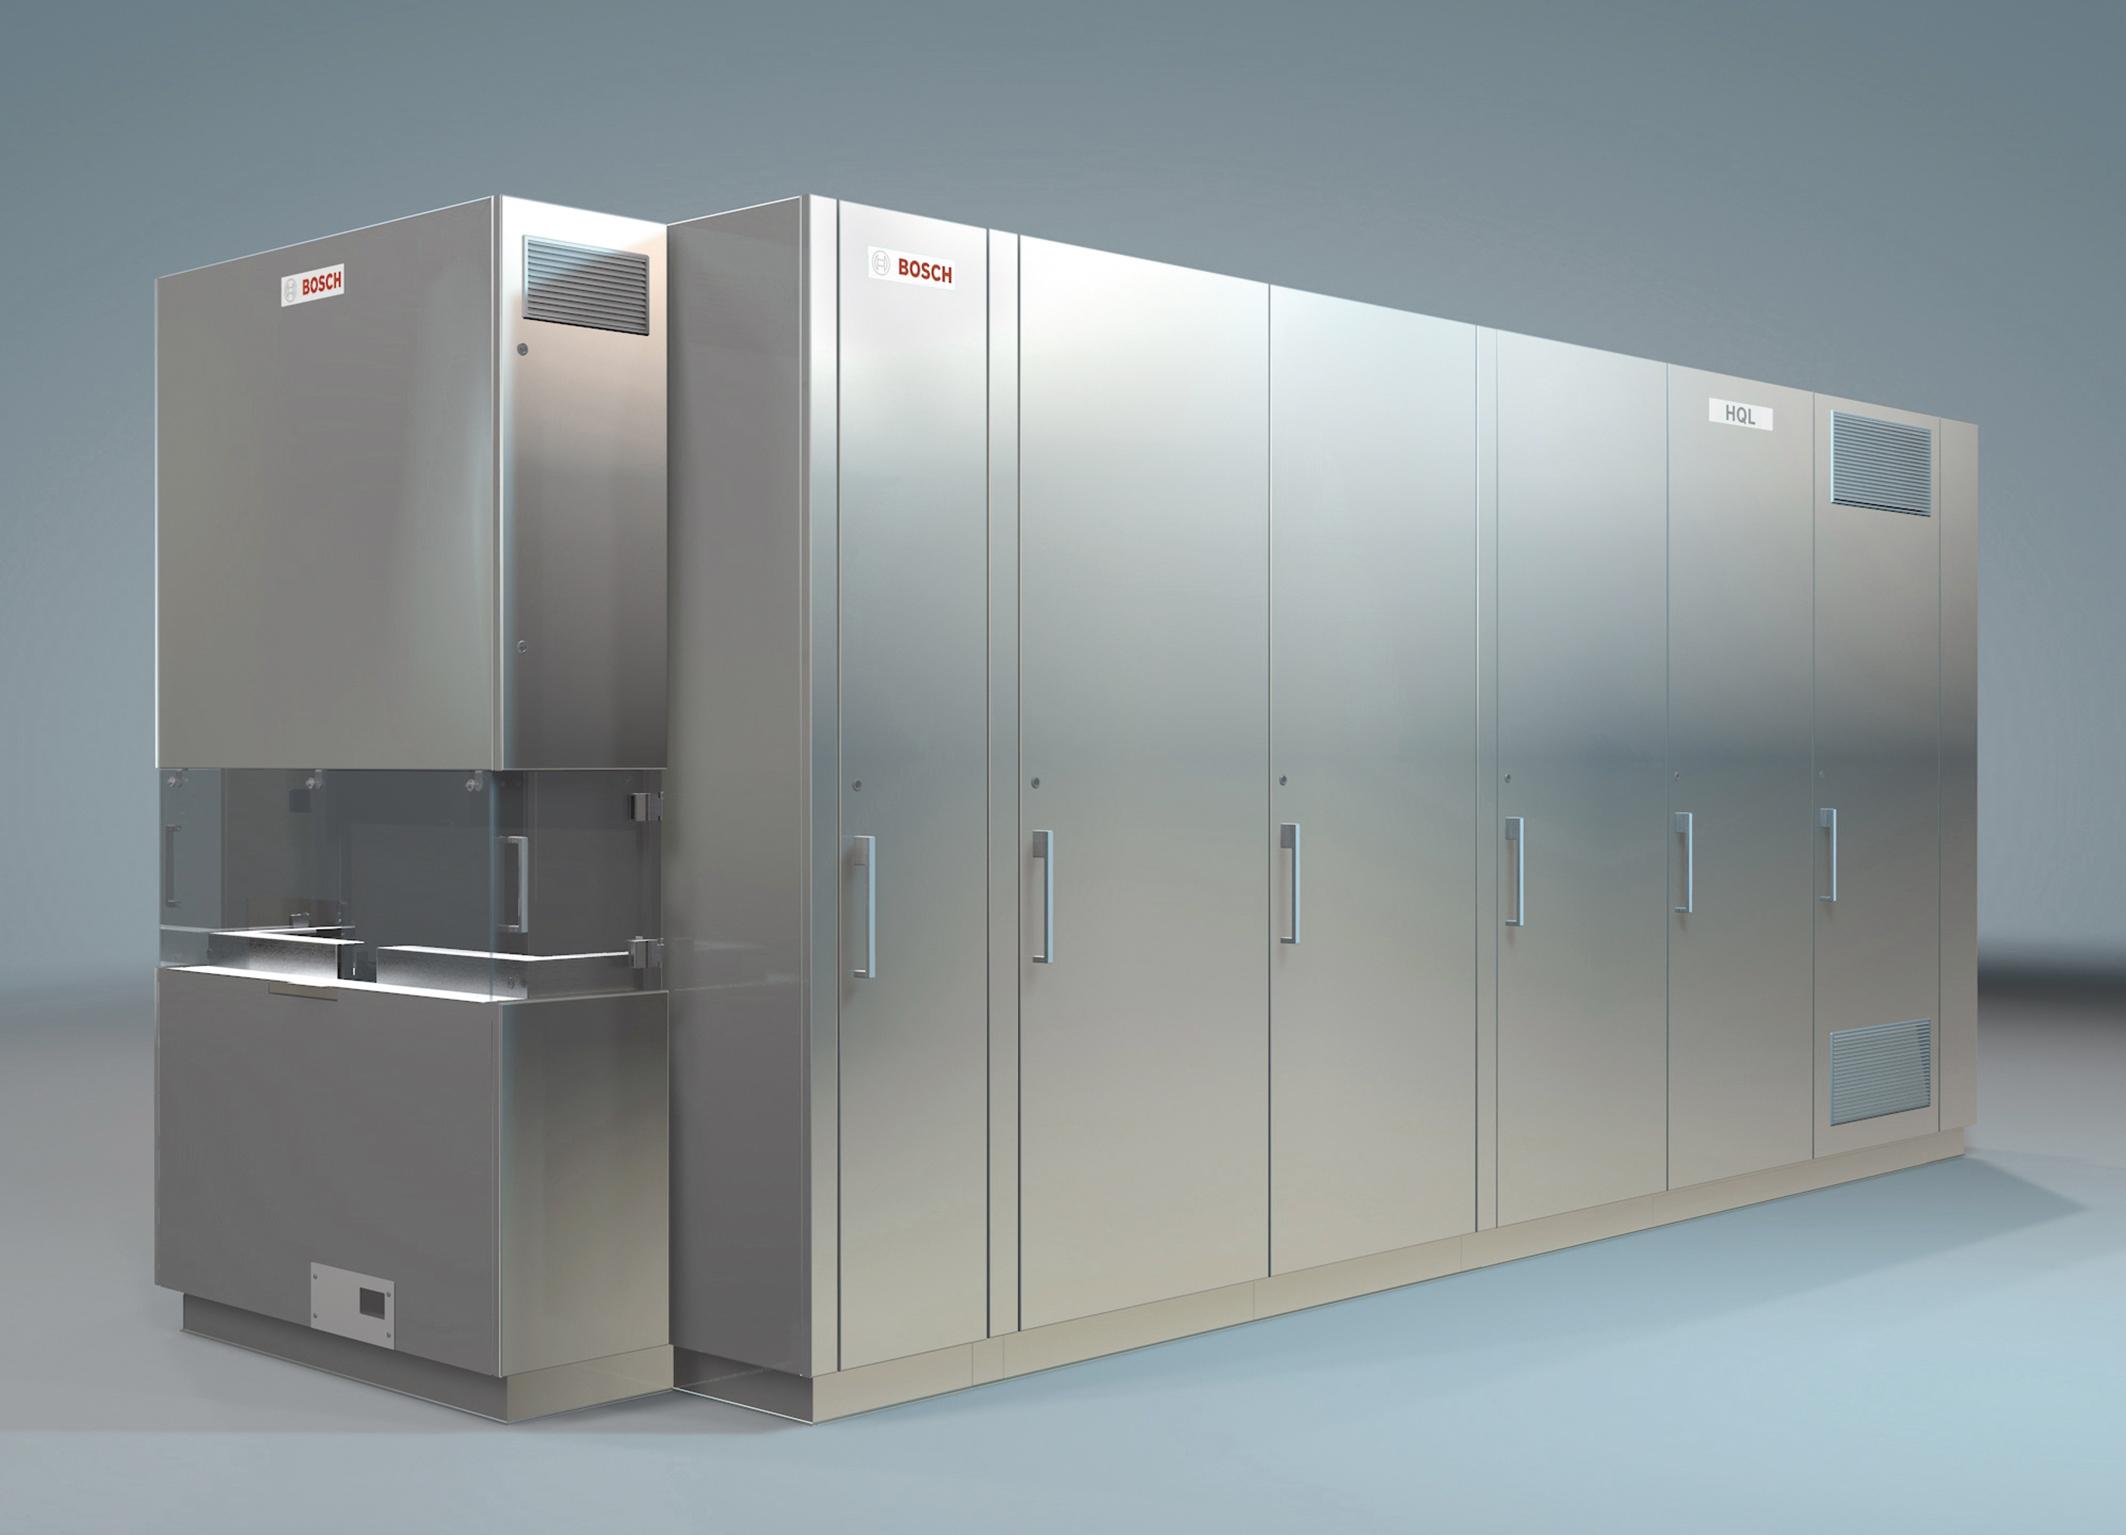 Bosch Introduces New Hql Sterilization Tunnel Series